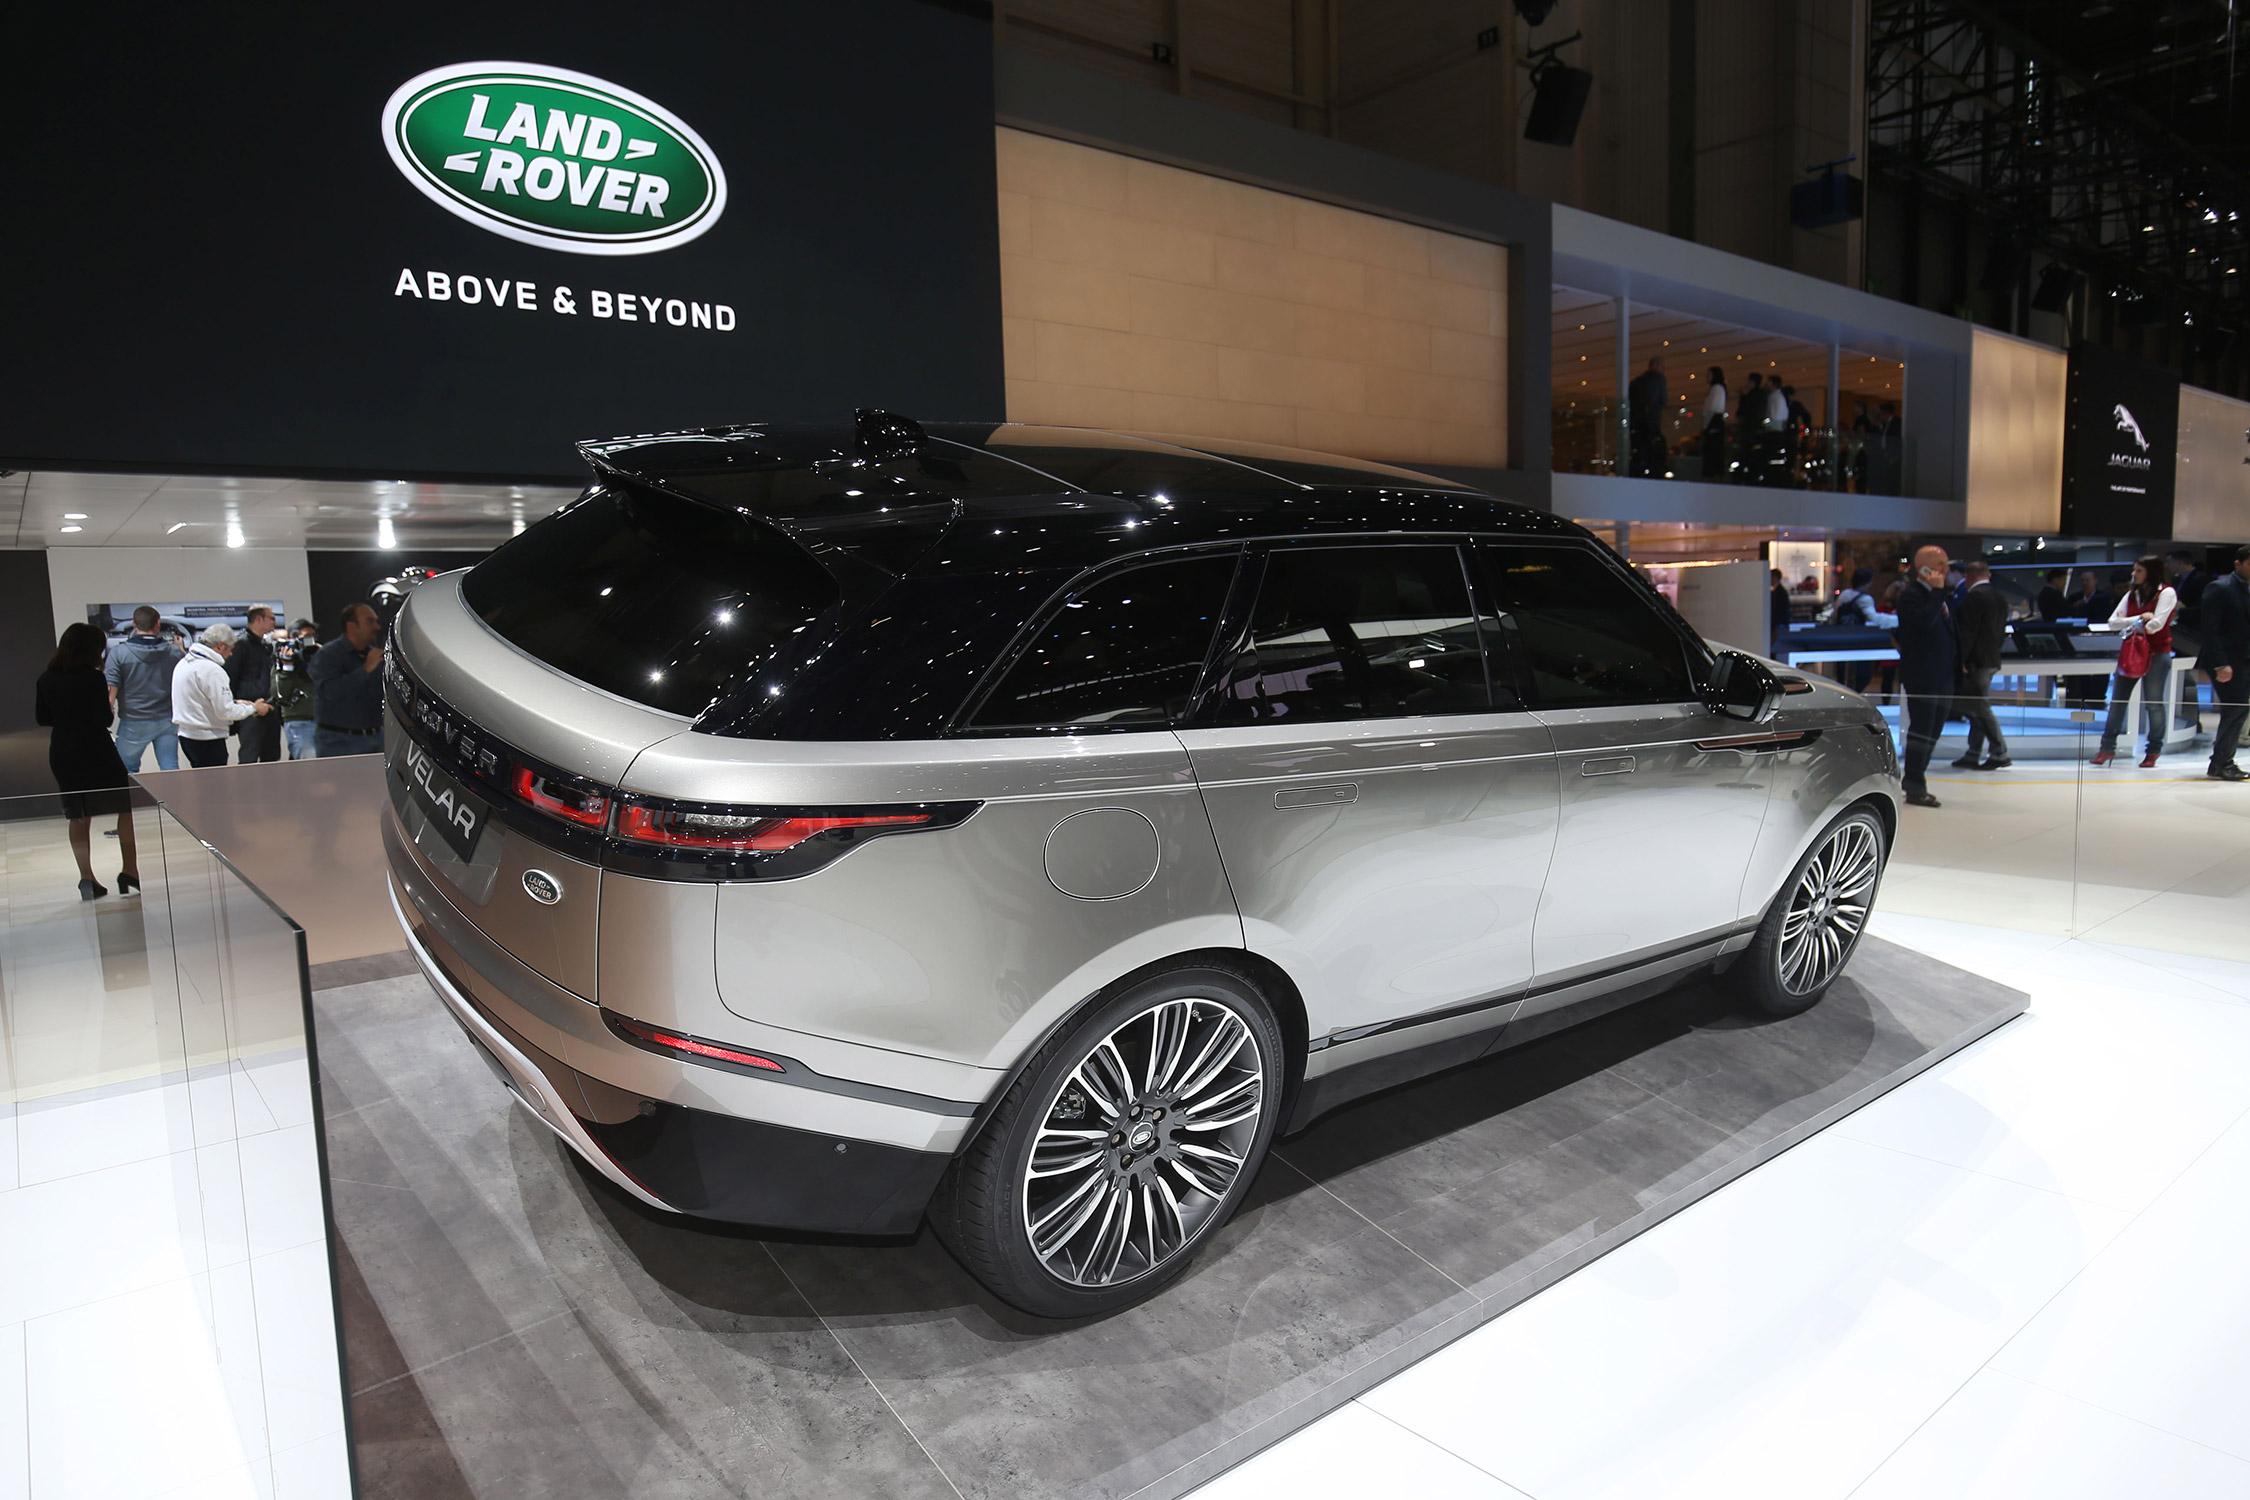 Velar Land Rover >> LAND ROVER Range Rover Velar - Salon de Genève 2017 - Motorlegend.com